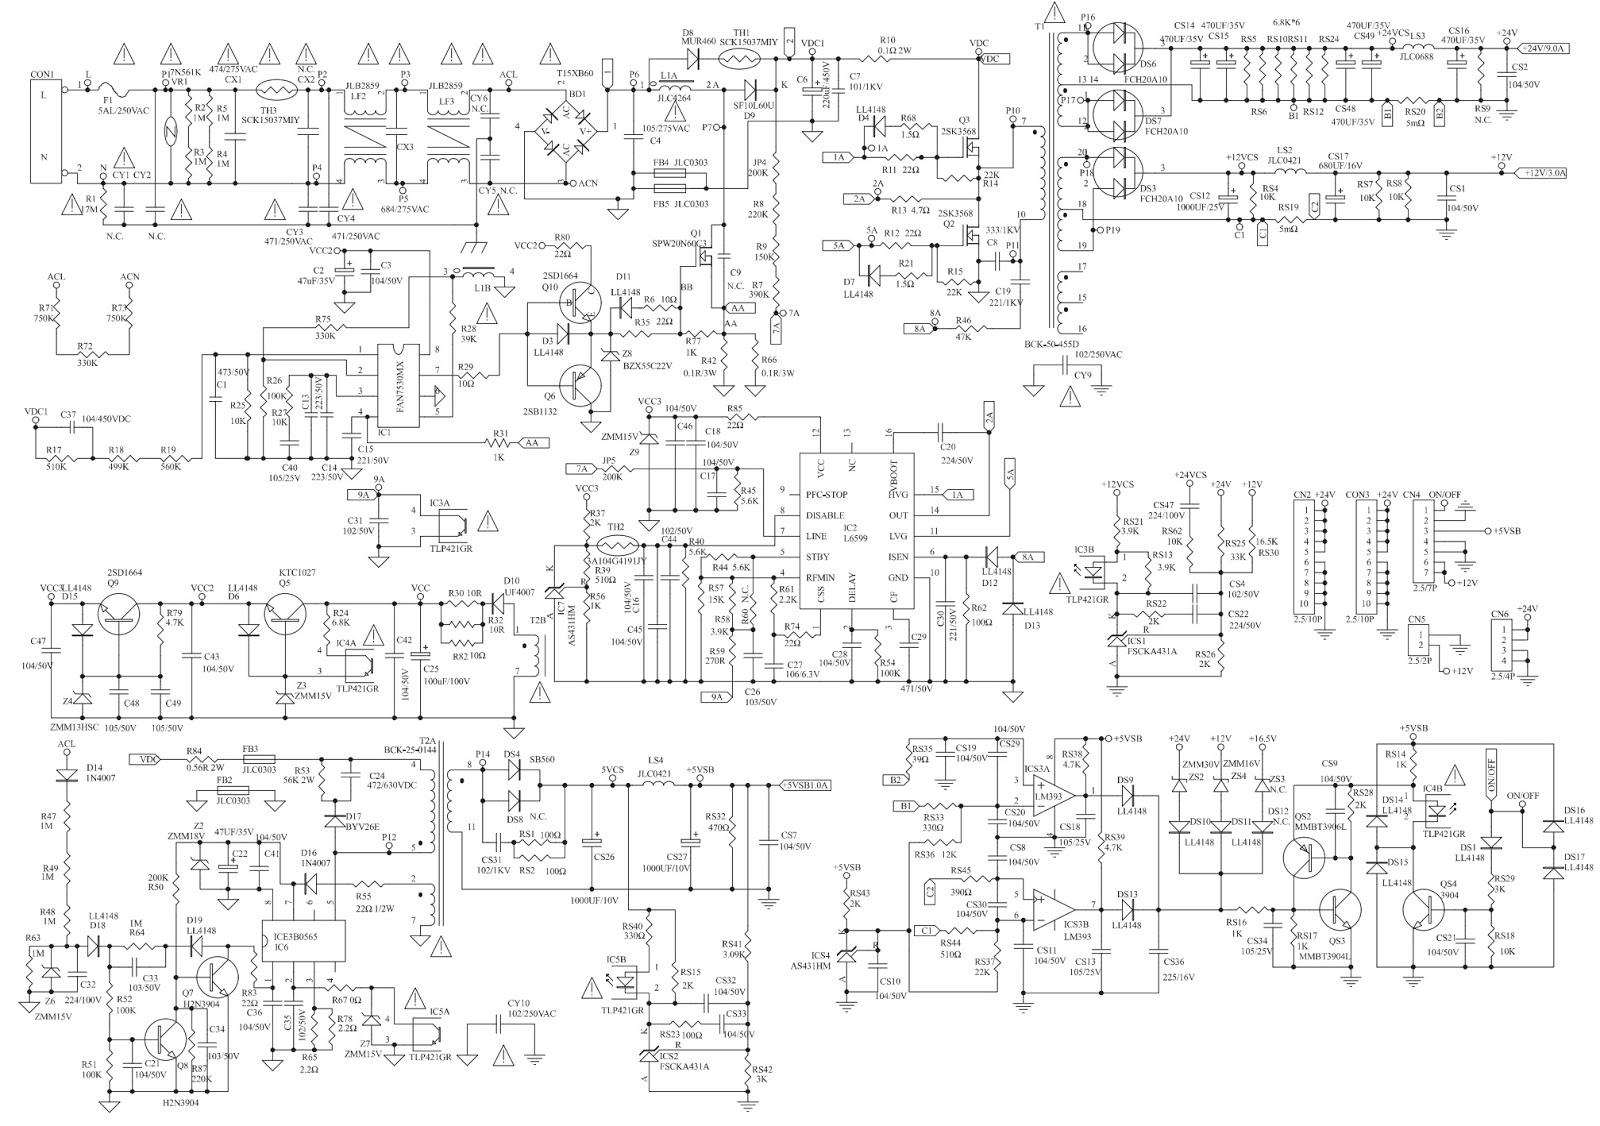 Comfortable Bluebird Bus Wiring Schematics Gallery - Electrical ...